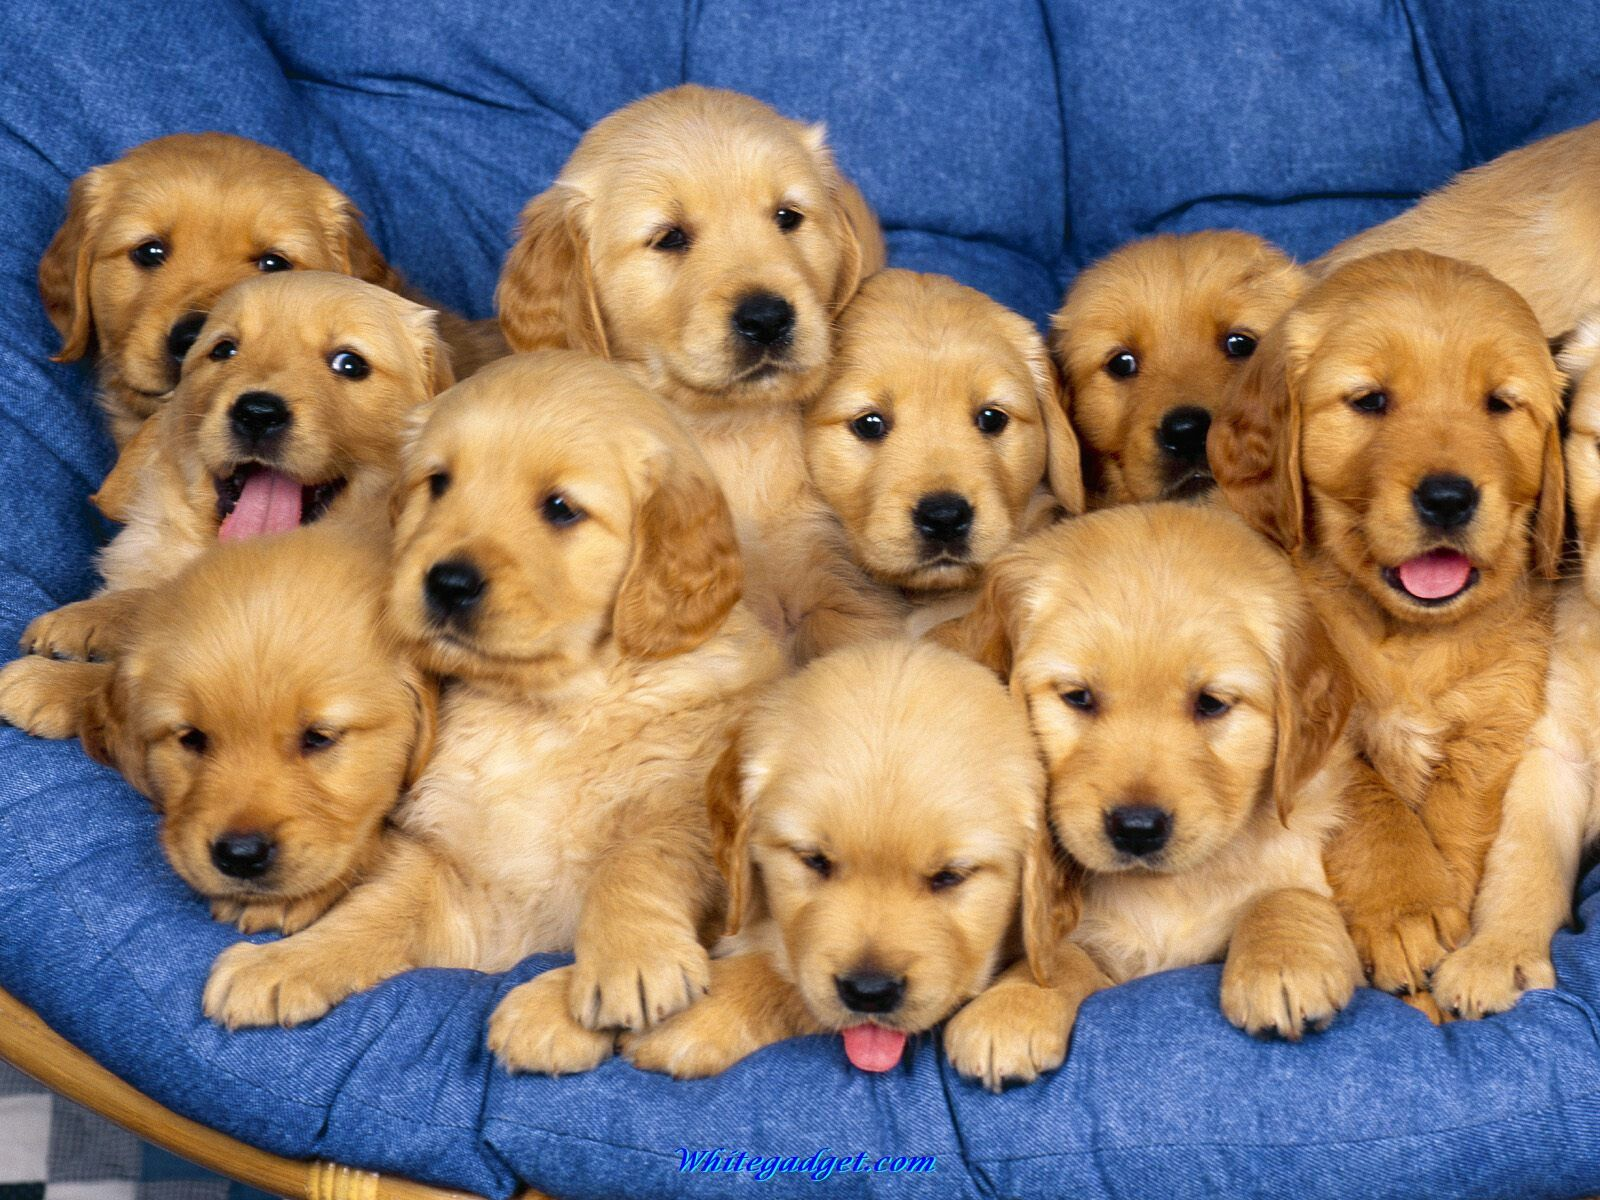 Dogs Wallpaper dog wallpapers wallpaper | hd wallpapers | pinterest | dog